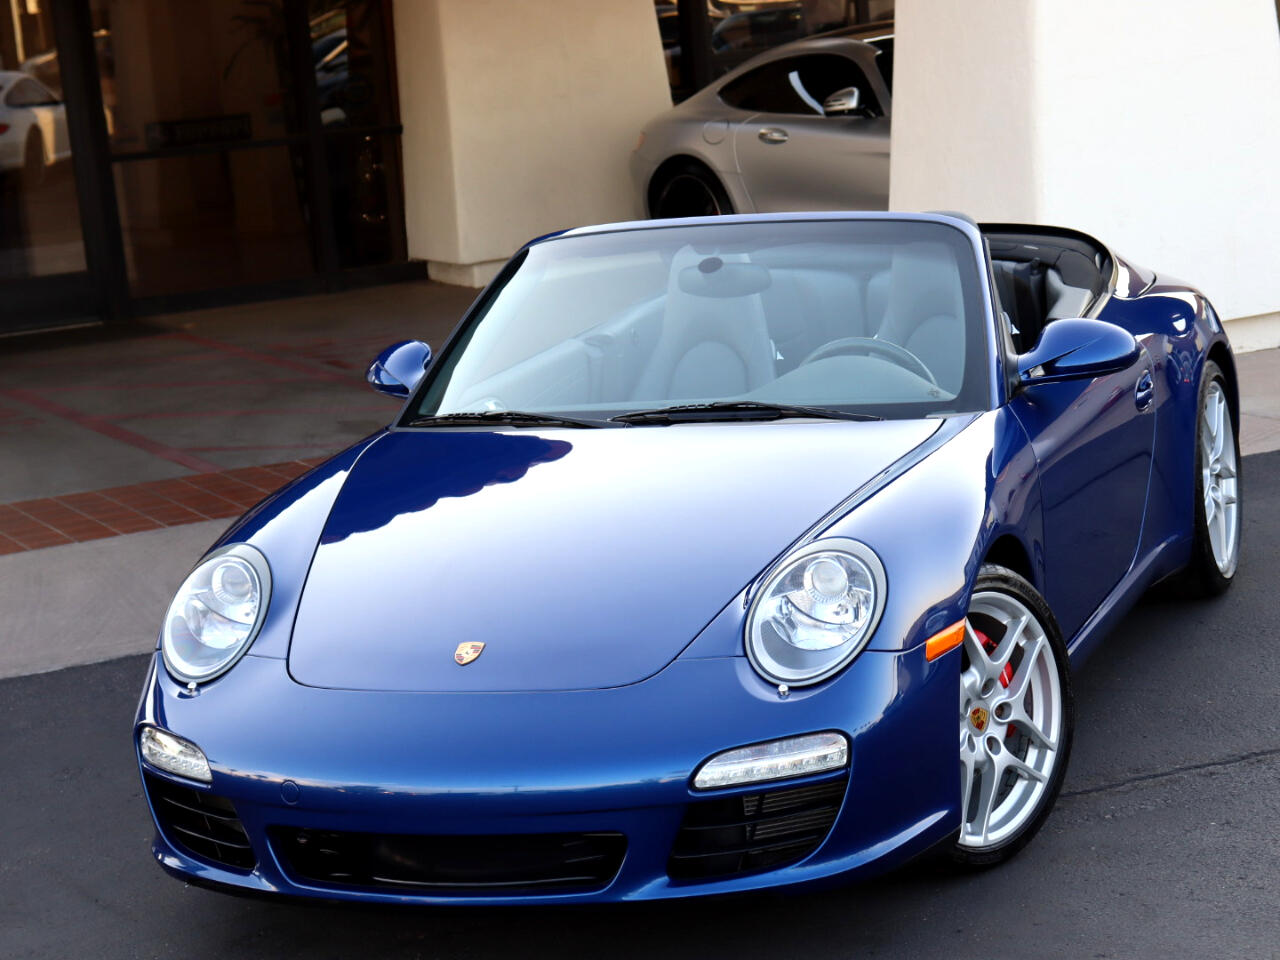 Porsche 911 Carrera S Cabriolet 2009